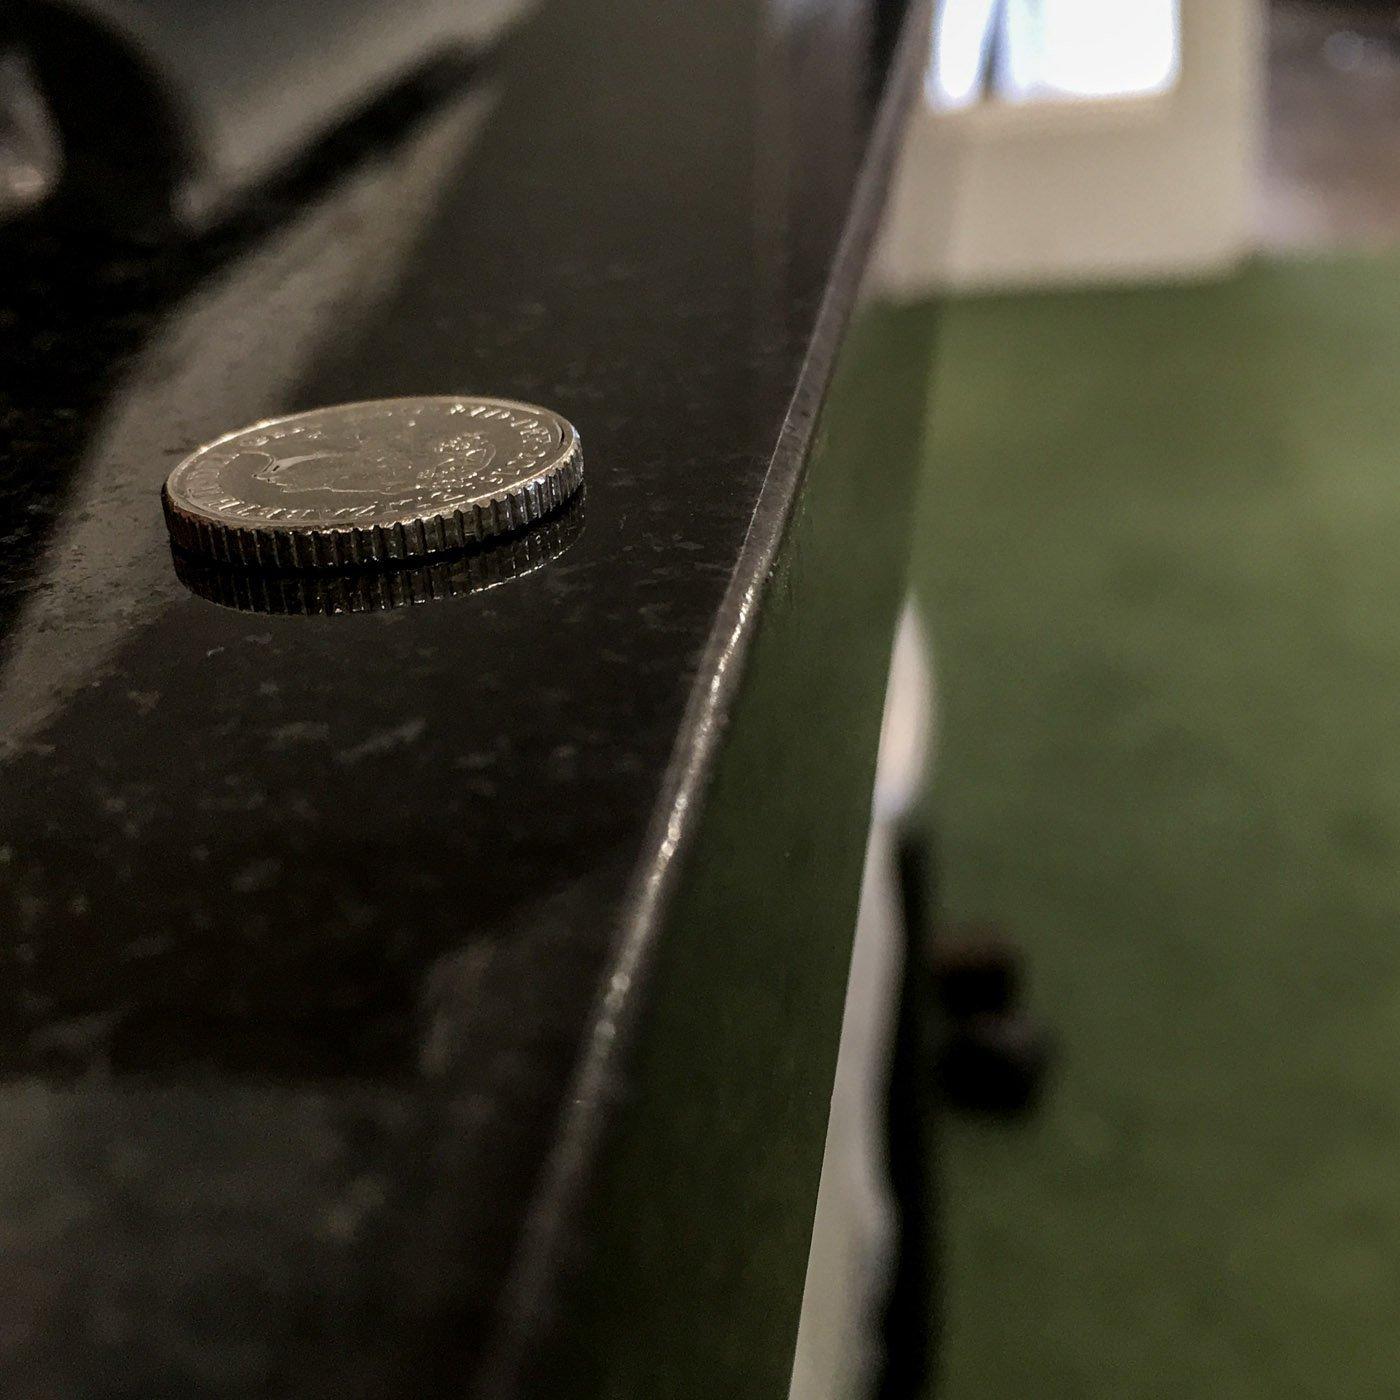 square-edge-on-30mm-nero-assoluto-granite-worktop